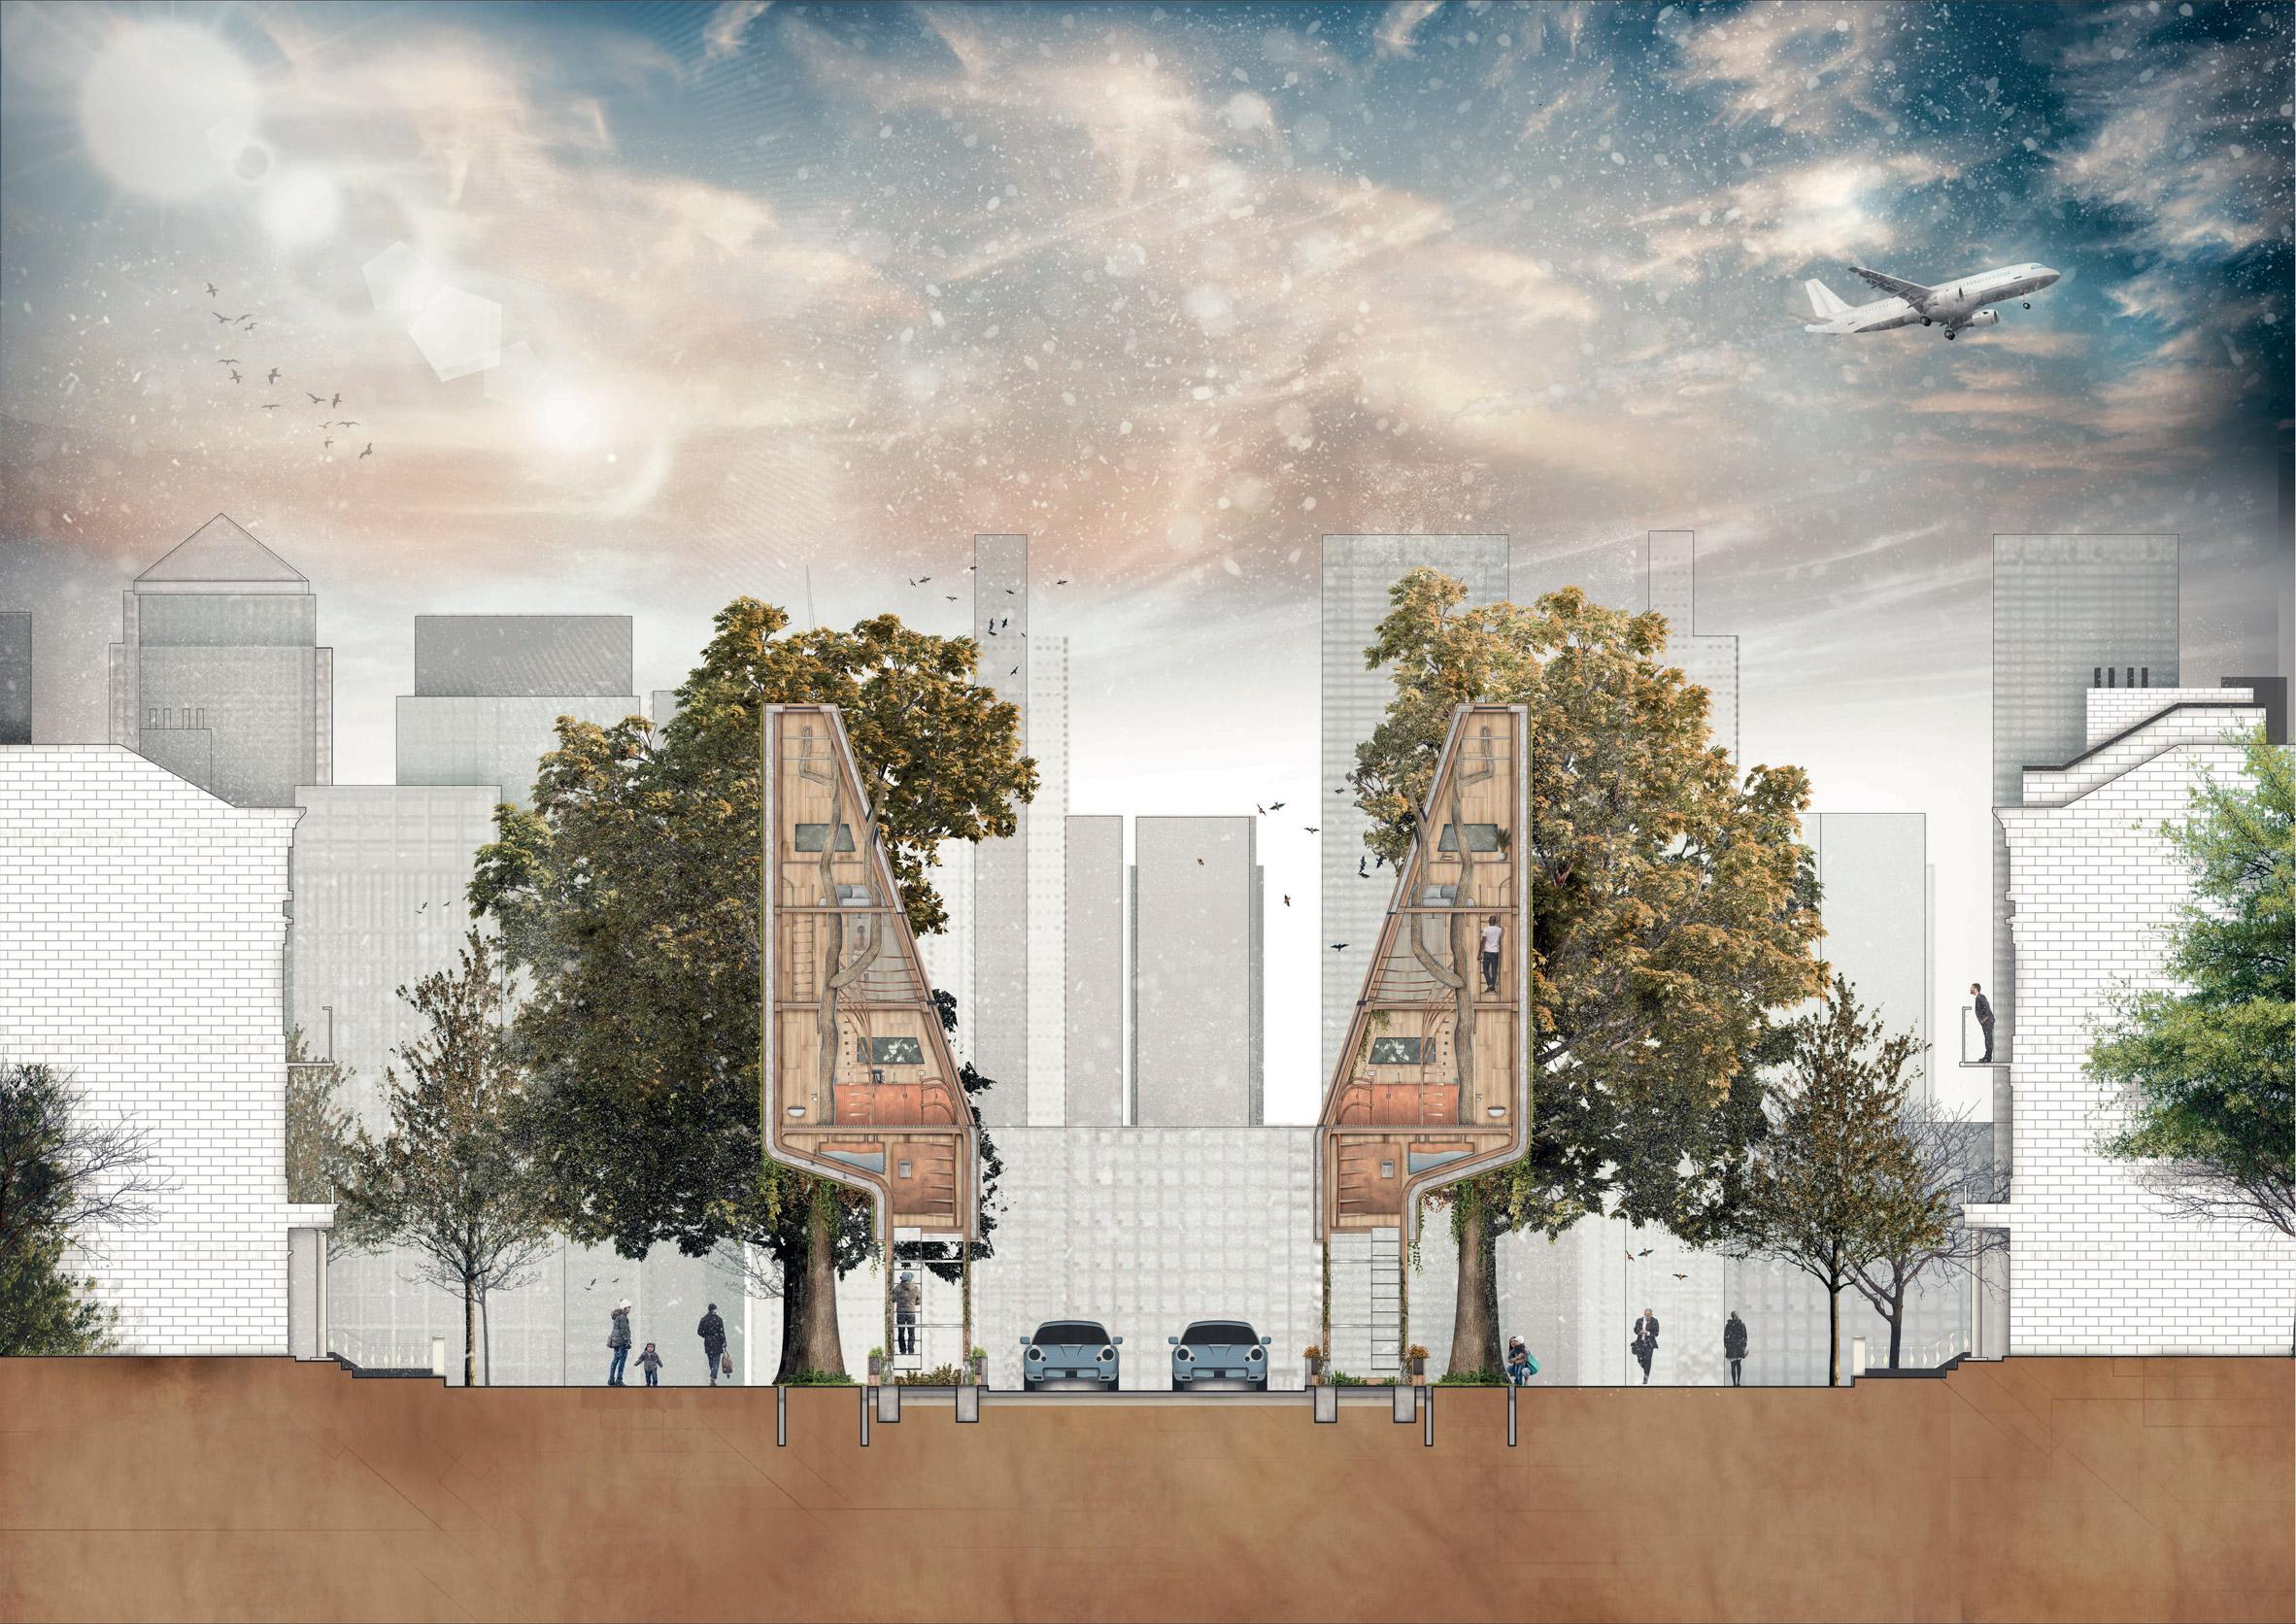 street_tree_pods_matthew_chamberlain_architecture_residential_housing_london_uk_dezeen_2364_col_4